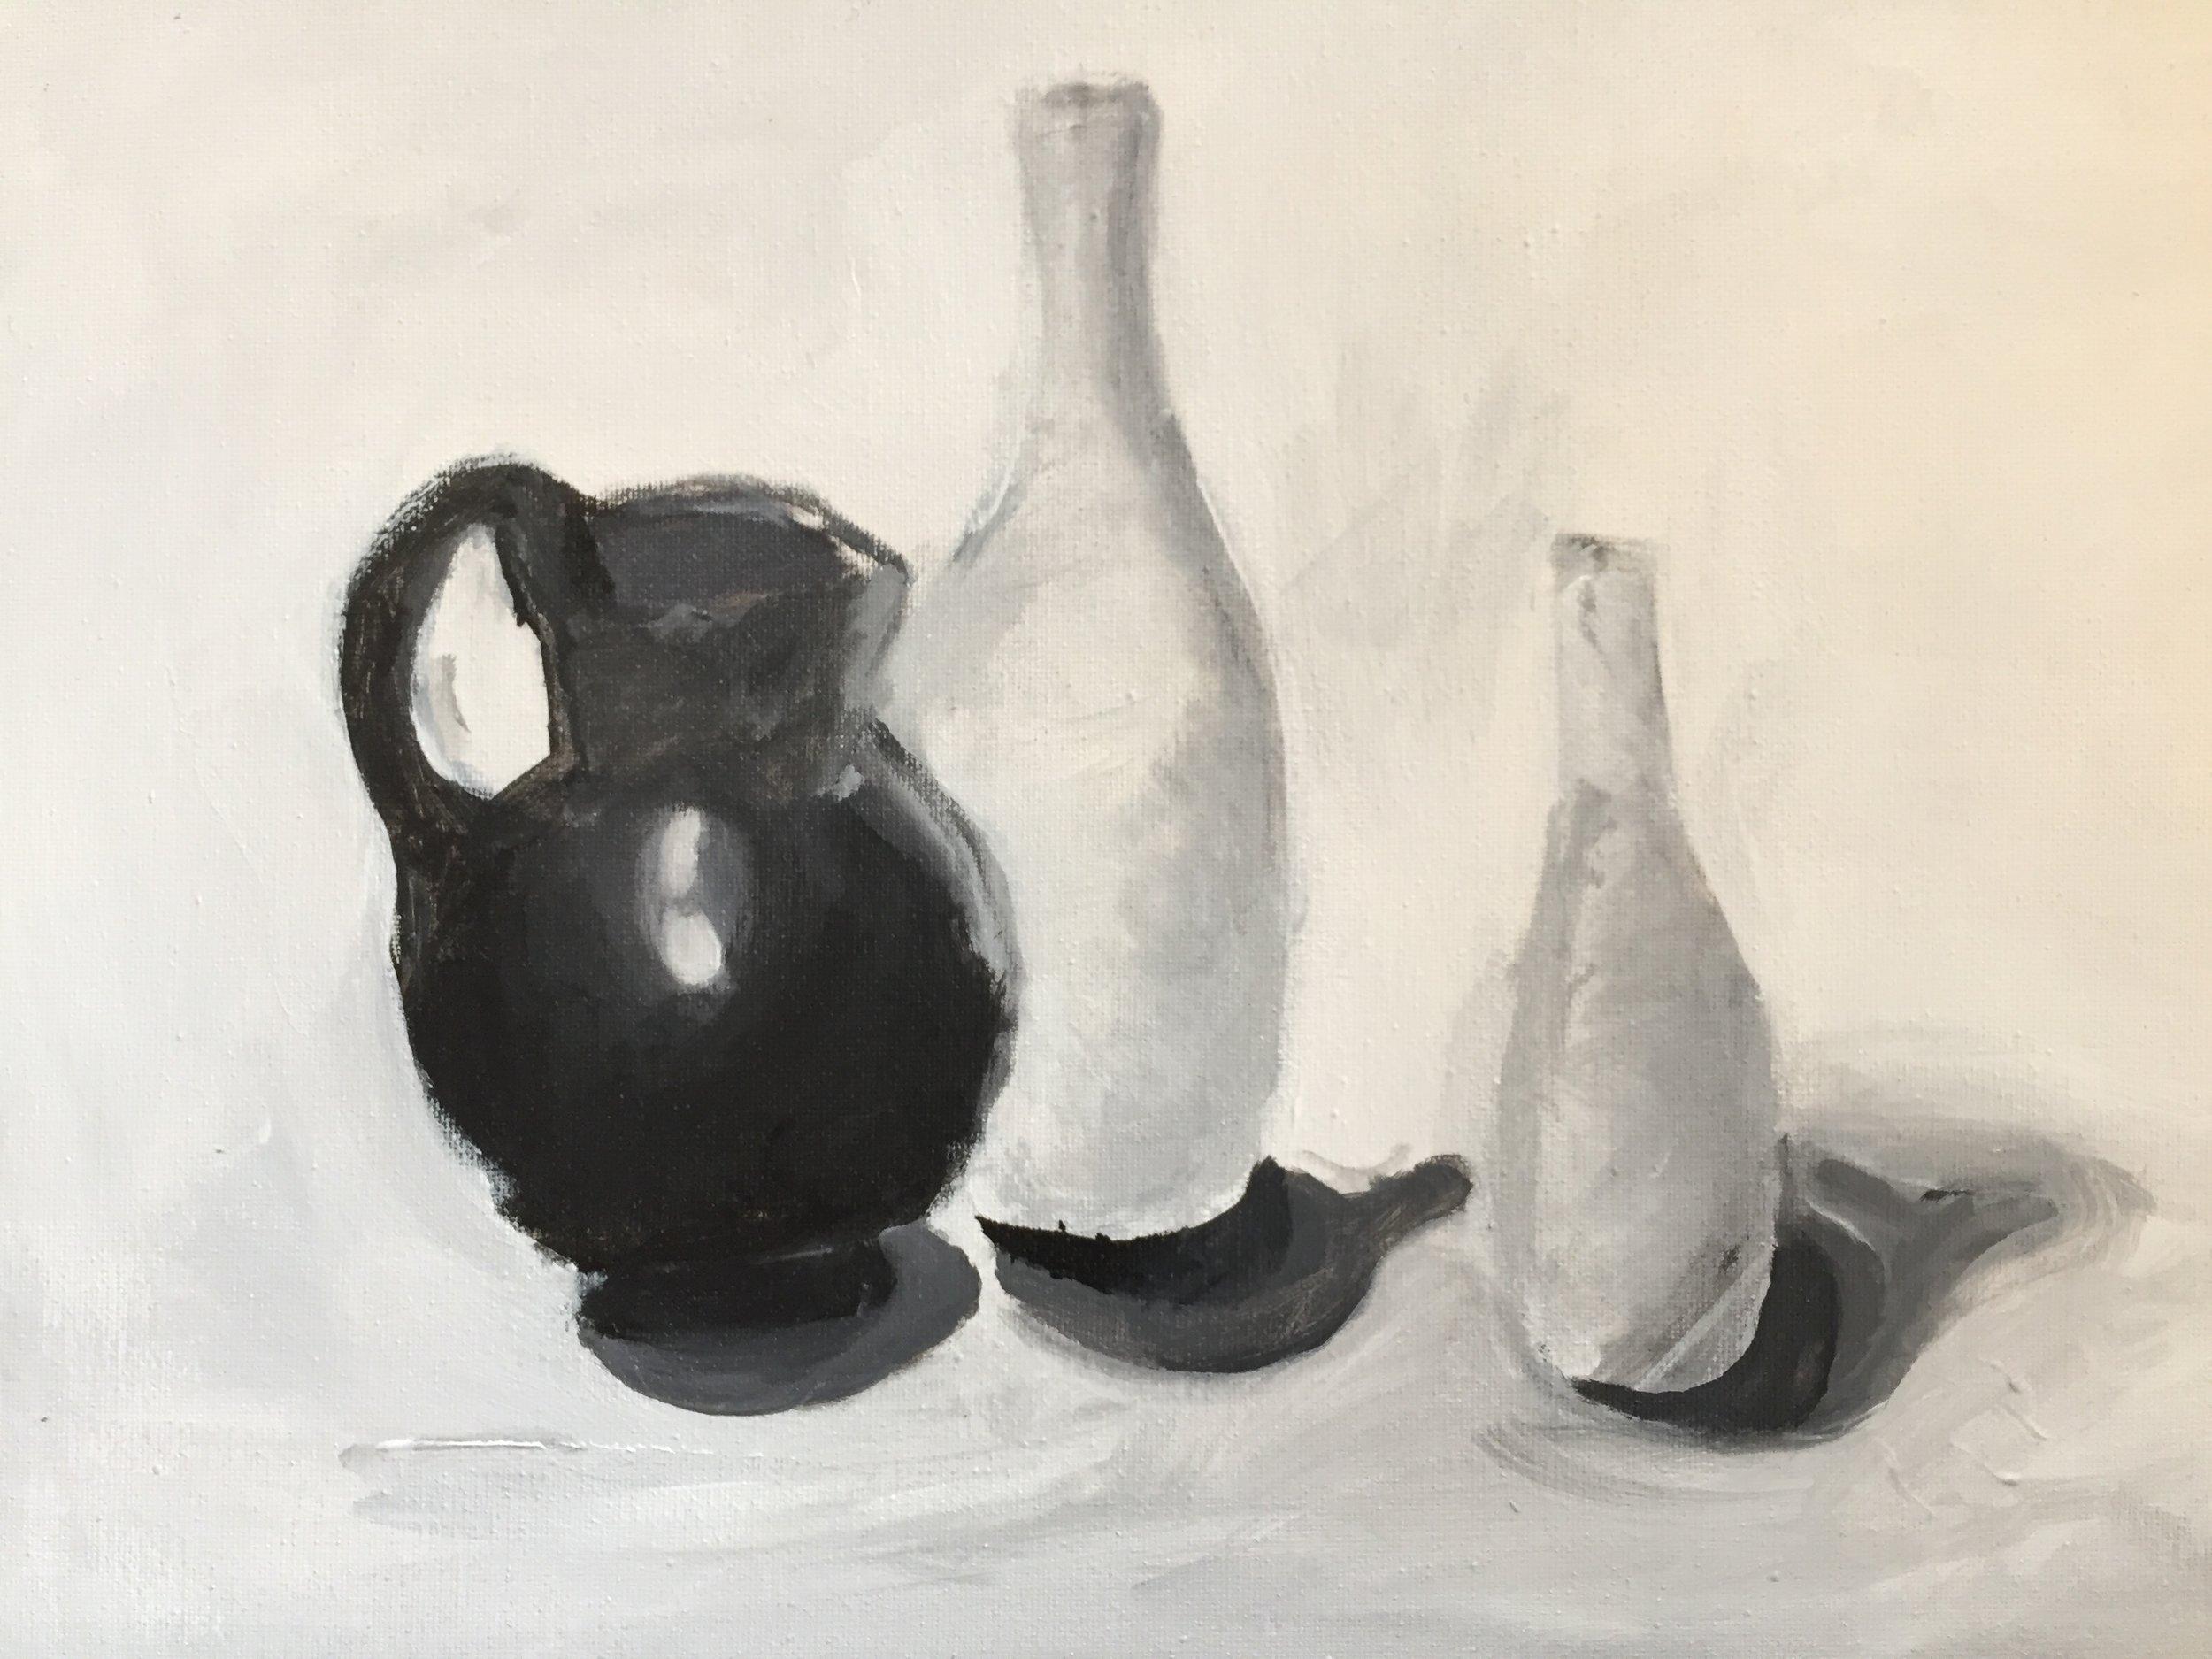 acrylic still life of vases